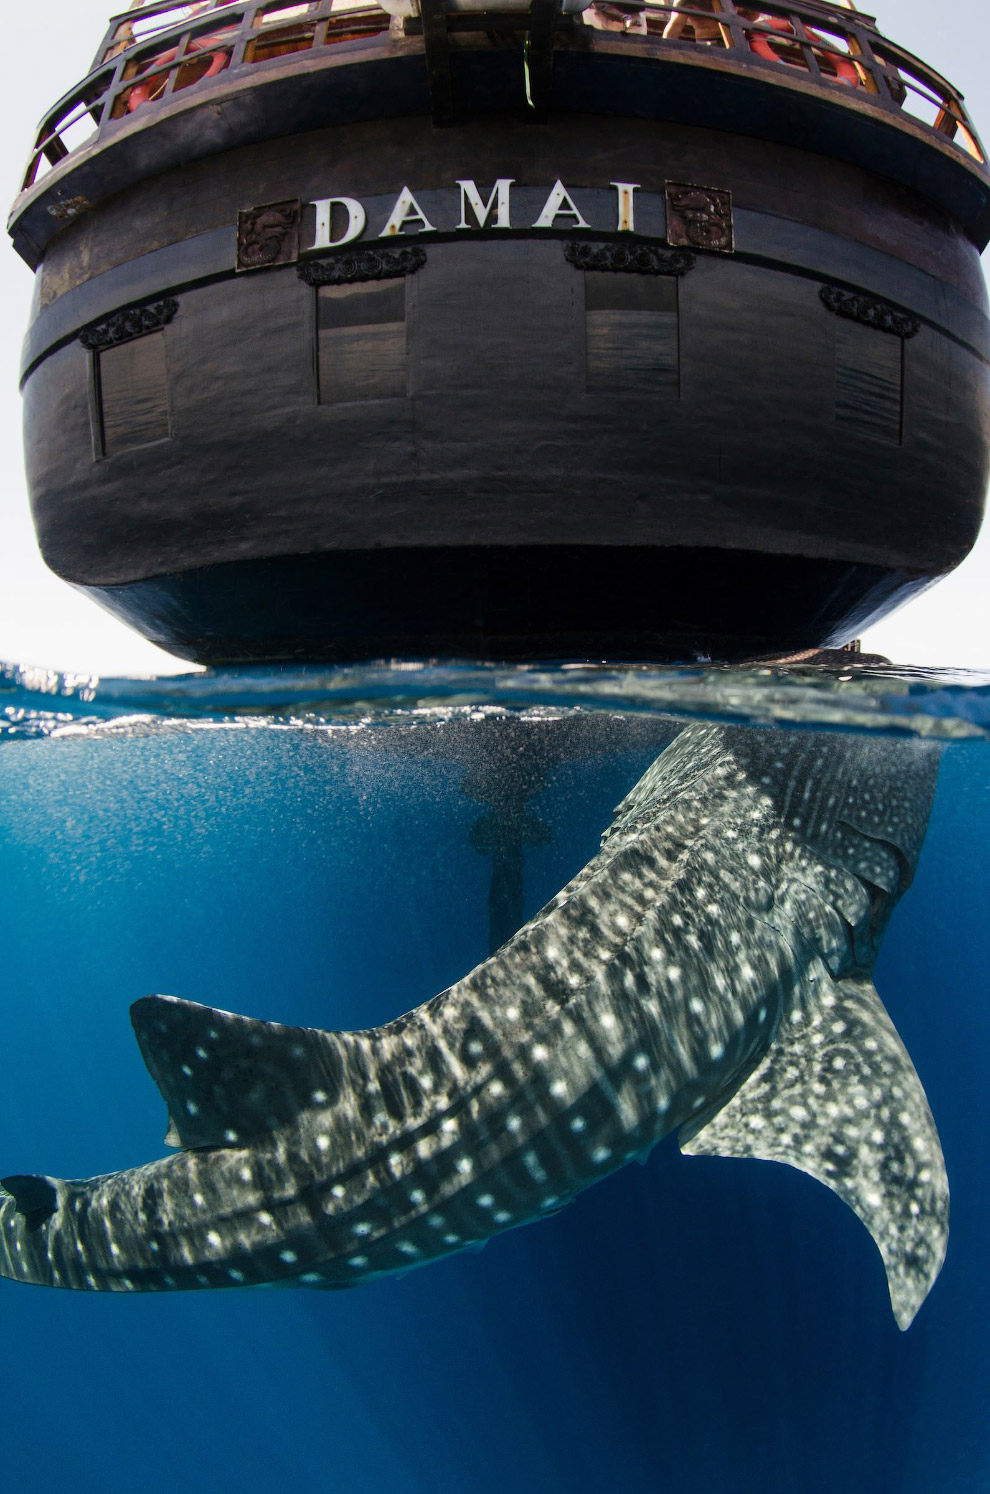 Акула и фактурный индонезийский парусник Дамай